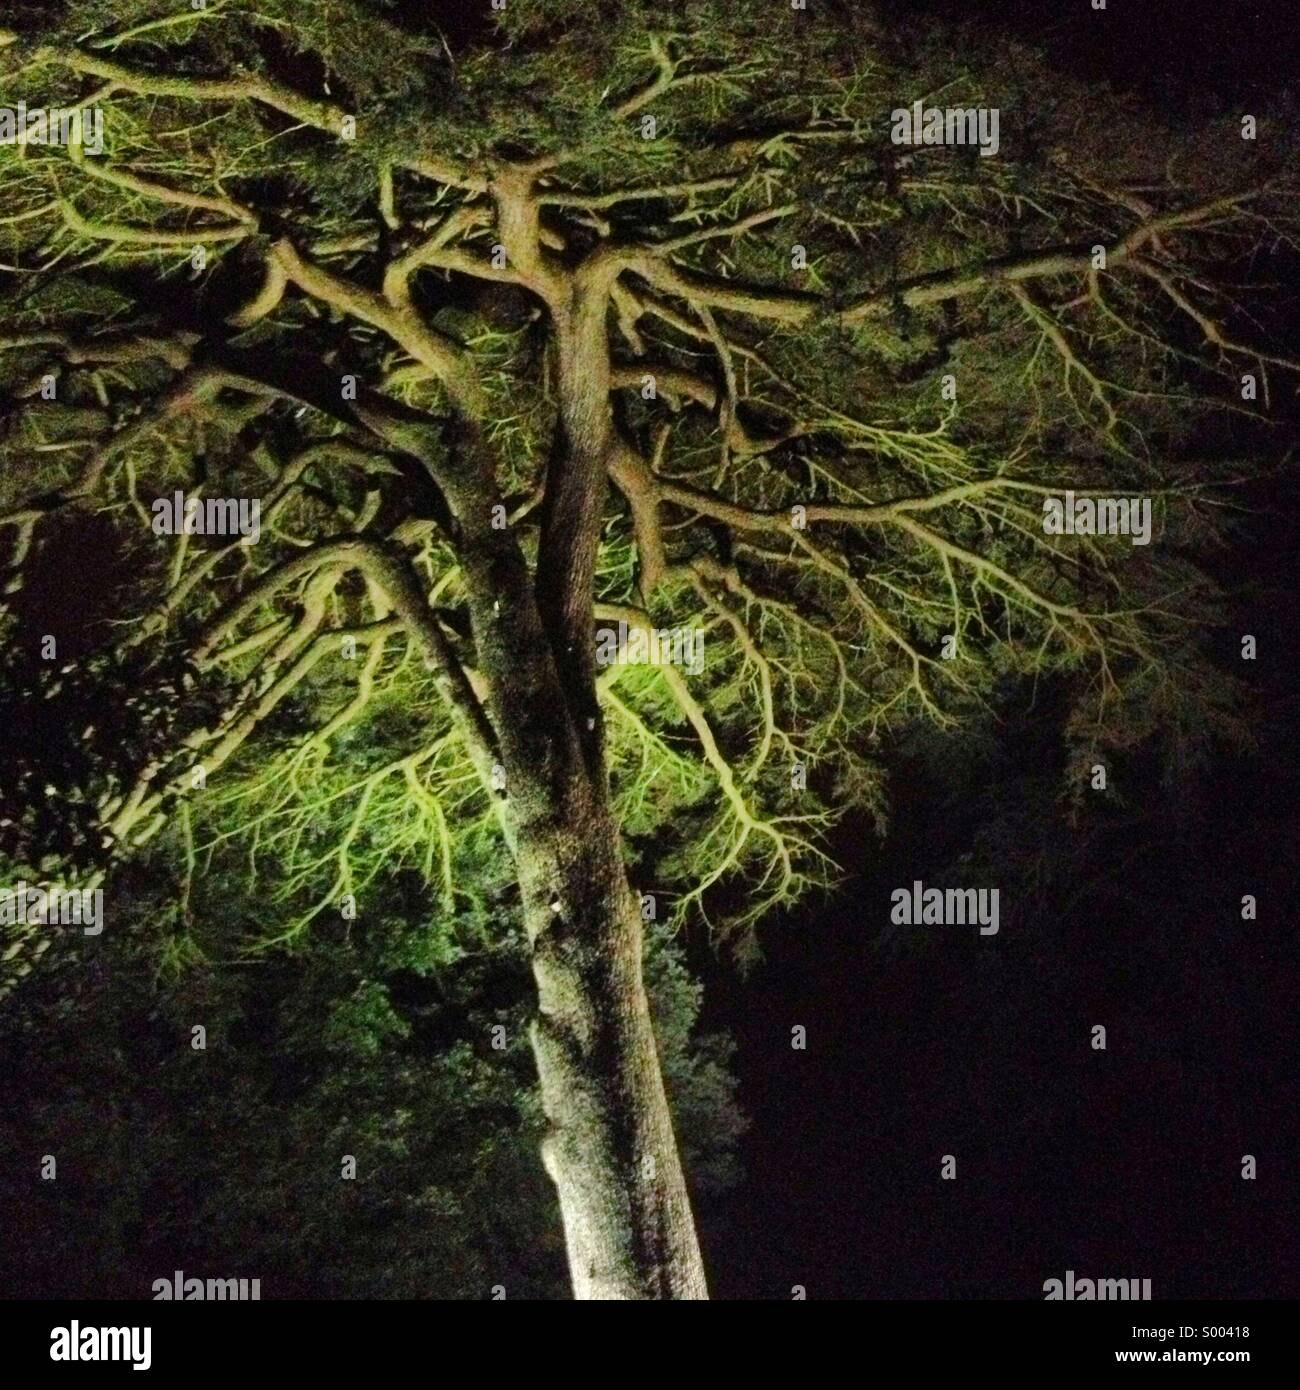 Hestercome Night Glow - Stock Image